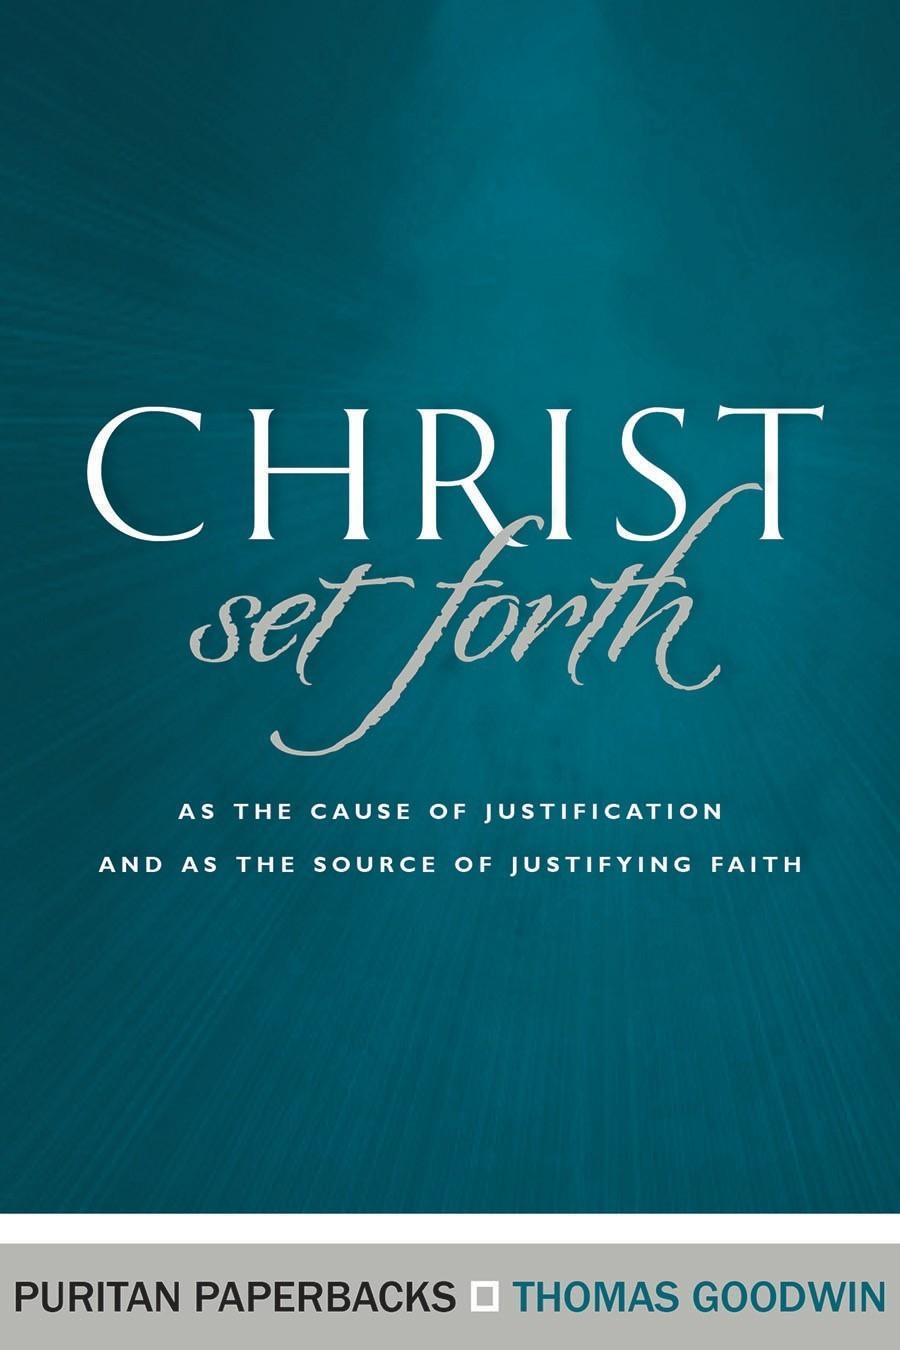 Christ Set Forth Thomas Goodwin